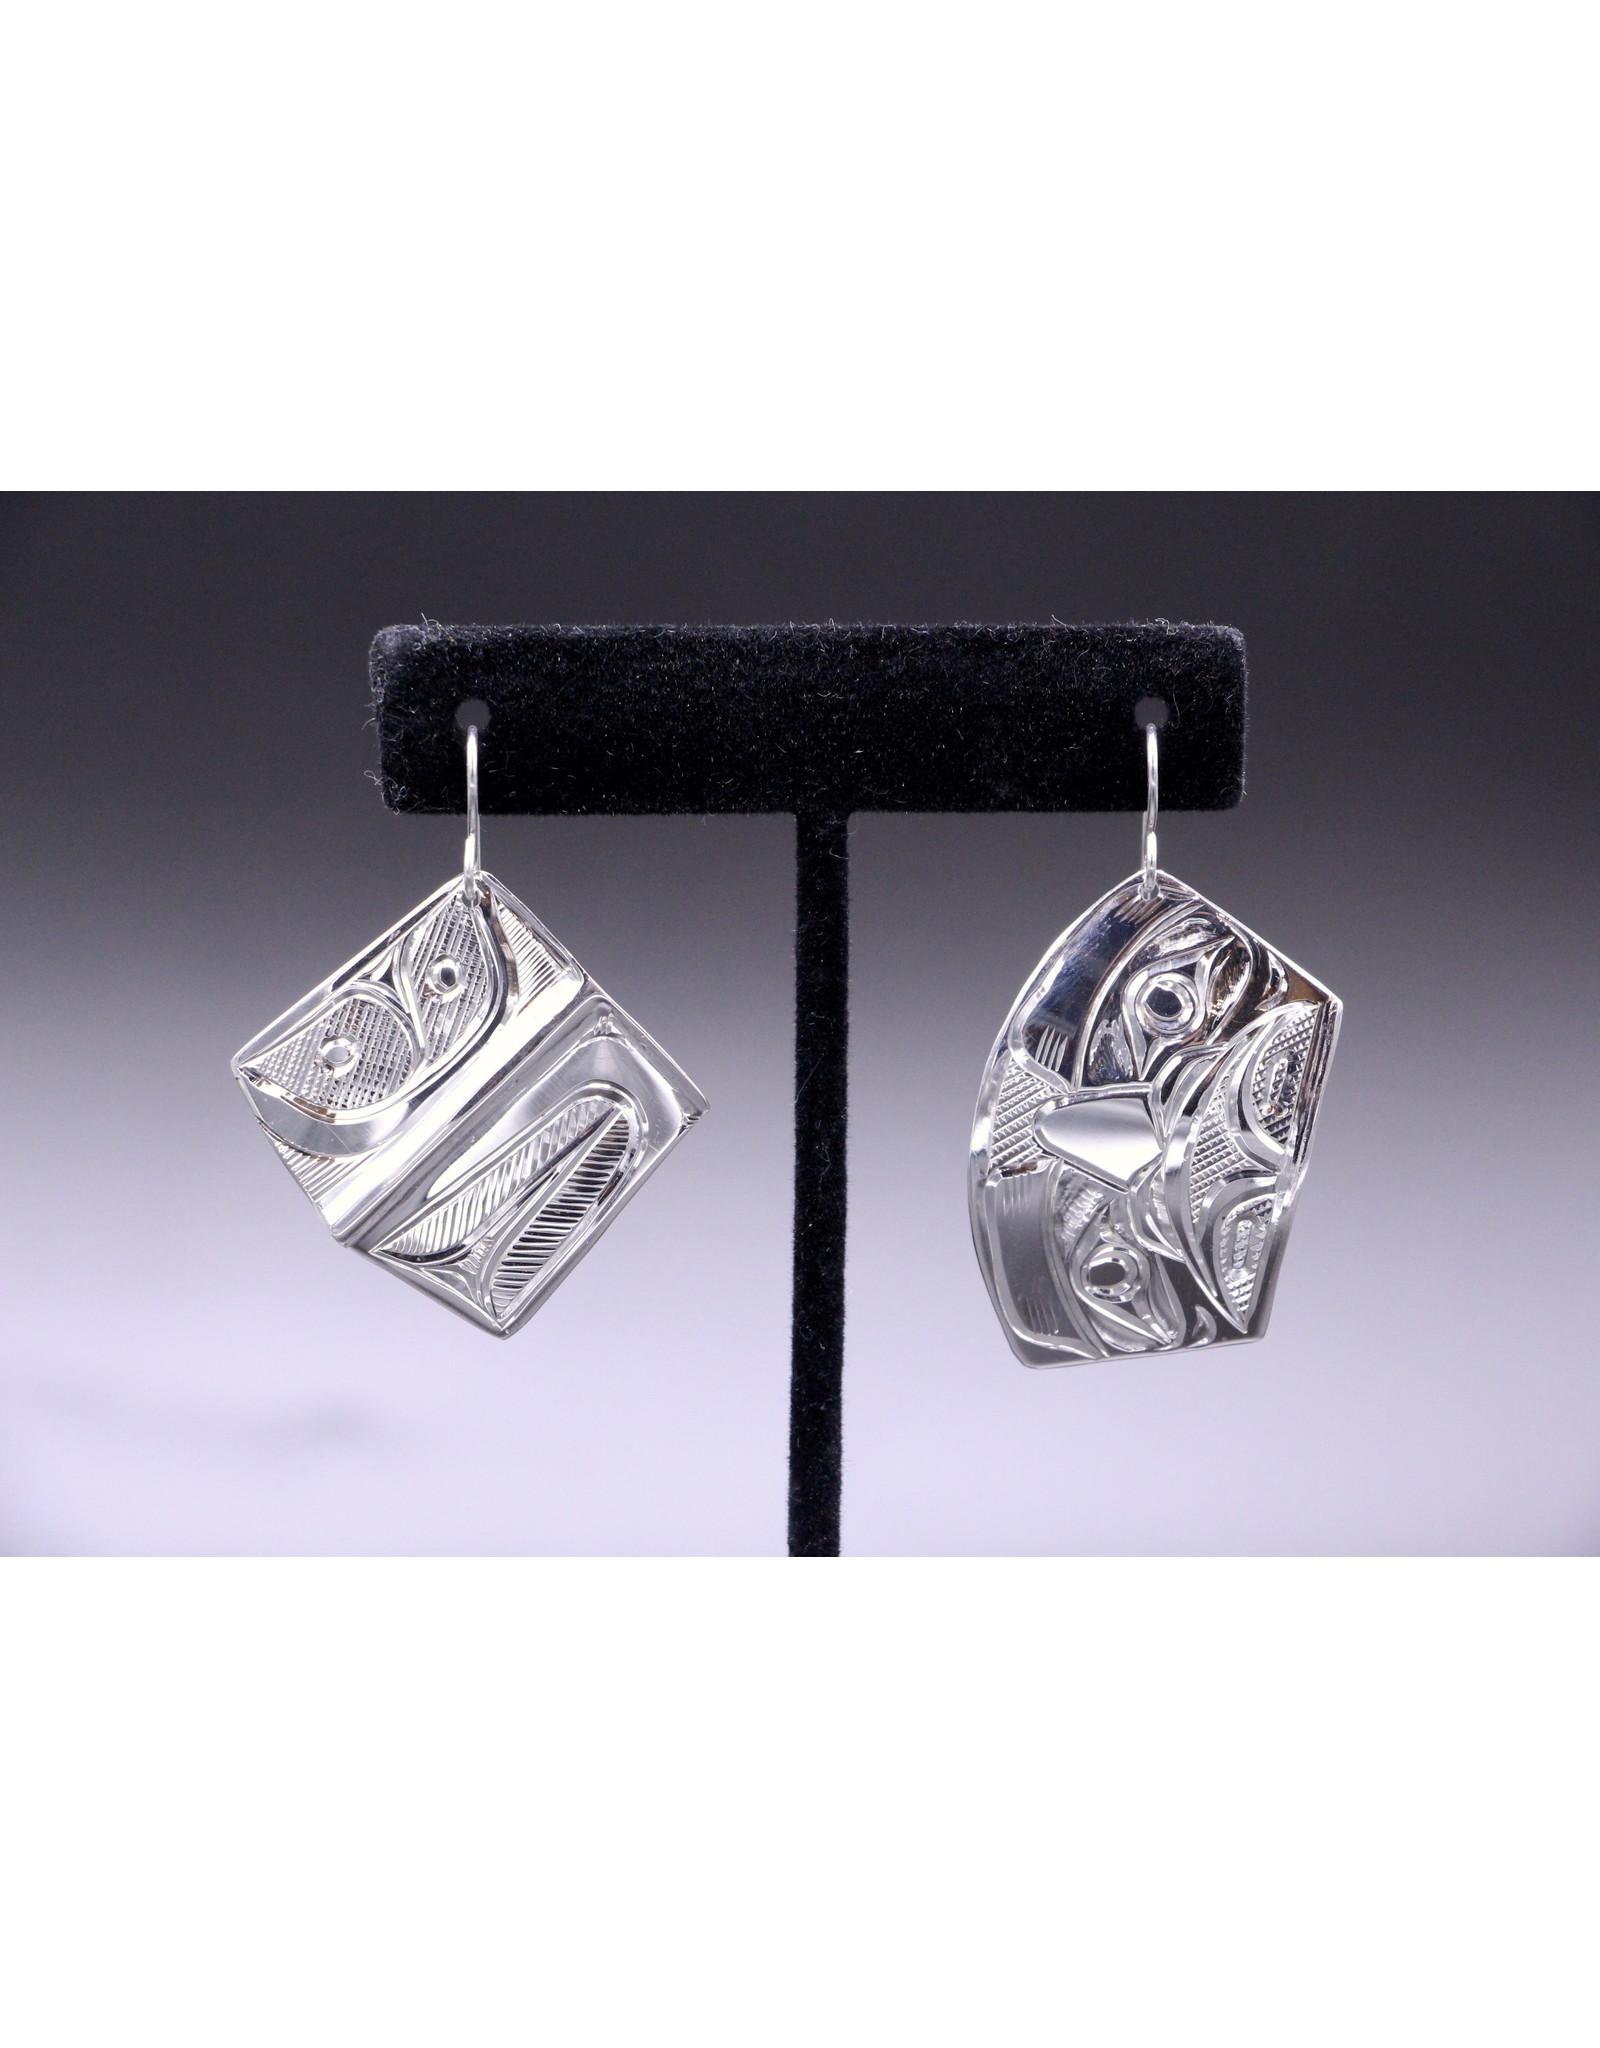 Eagle Earrings by Corrine Hunt - CHE1